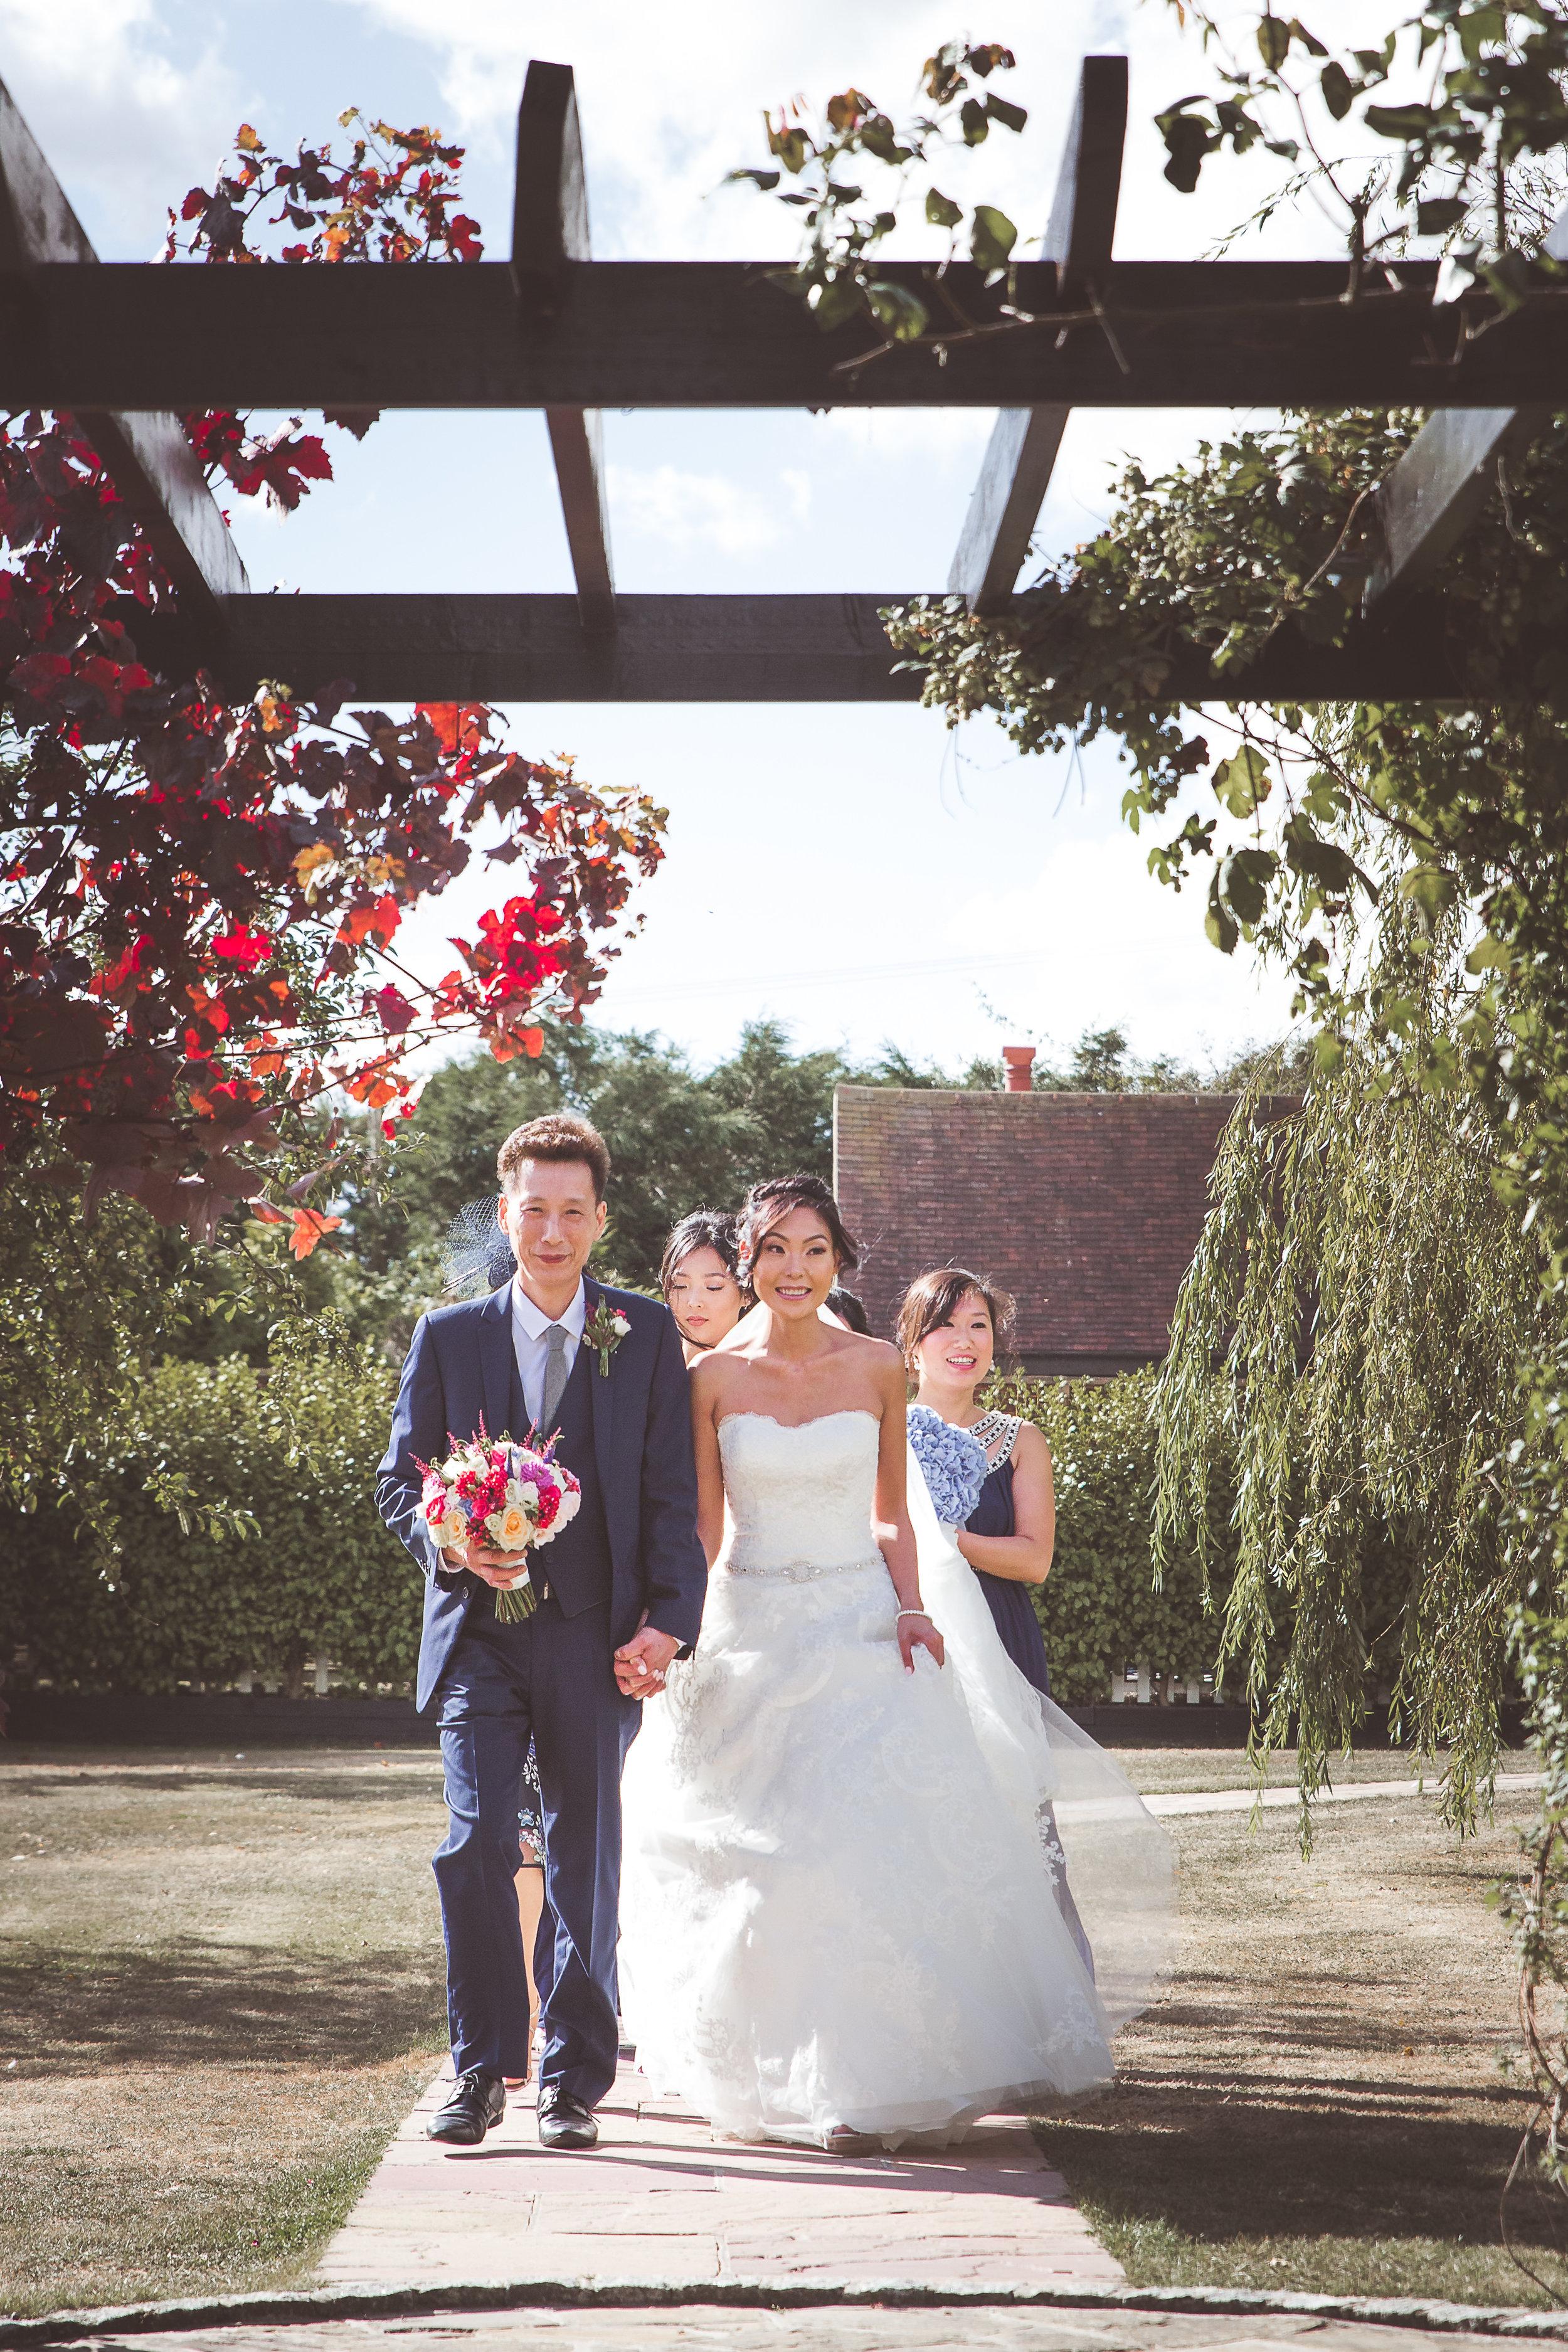 Tszwan  Ben High House wedding photos-2113.JPG